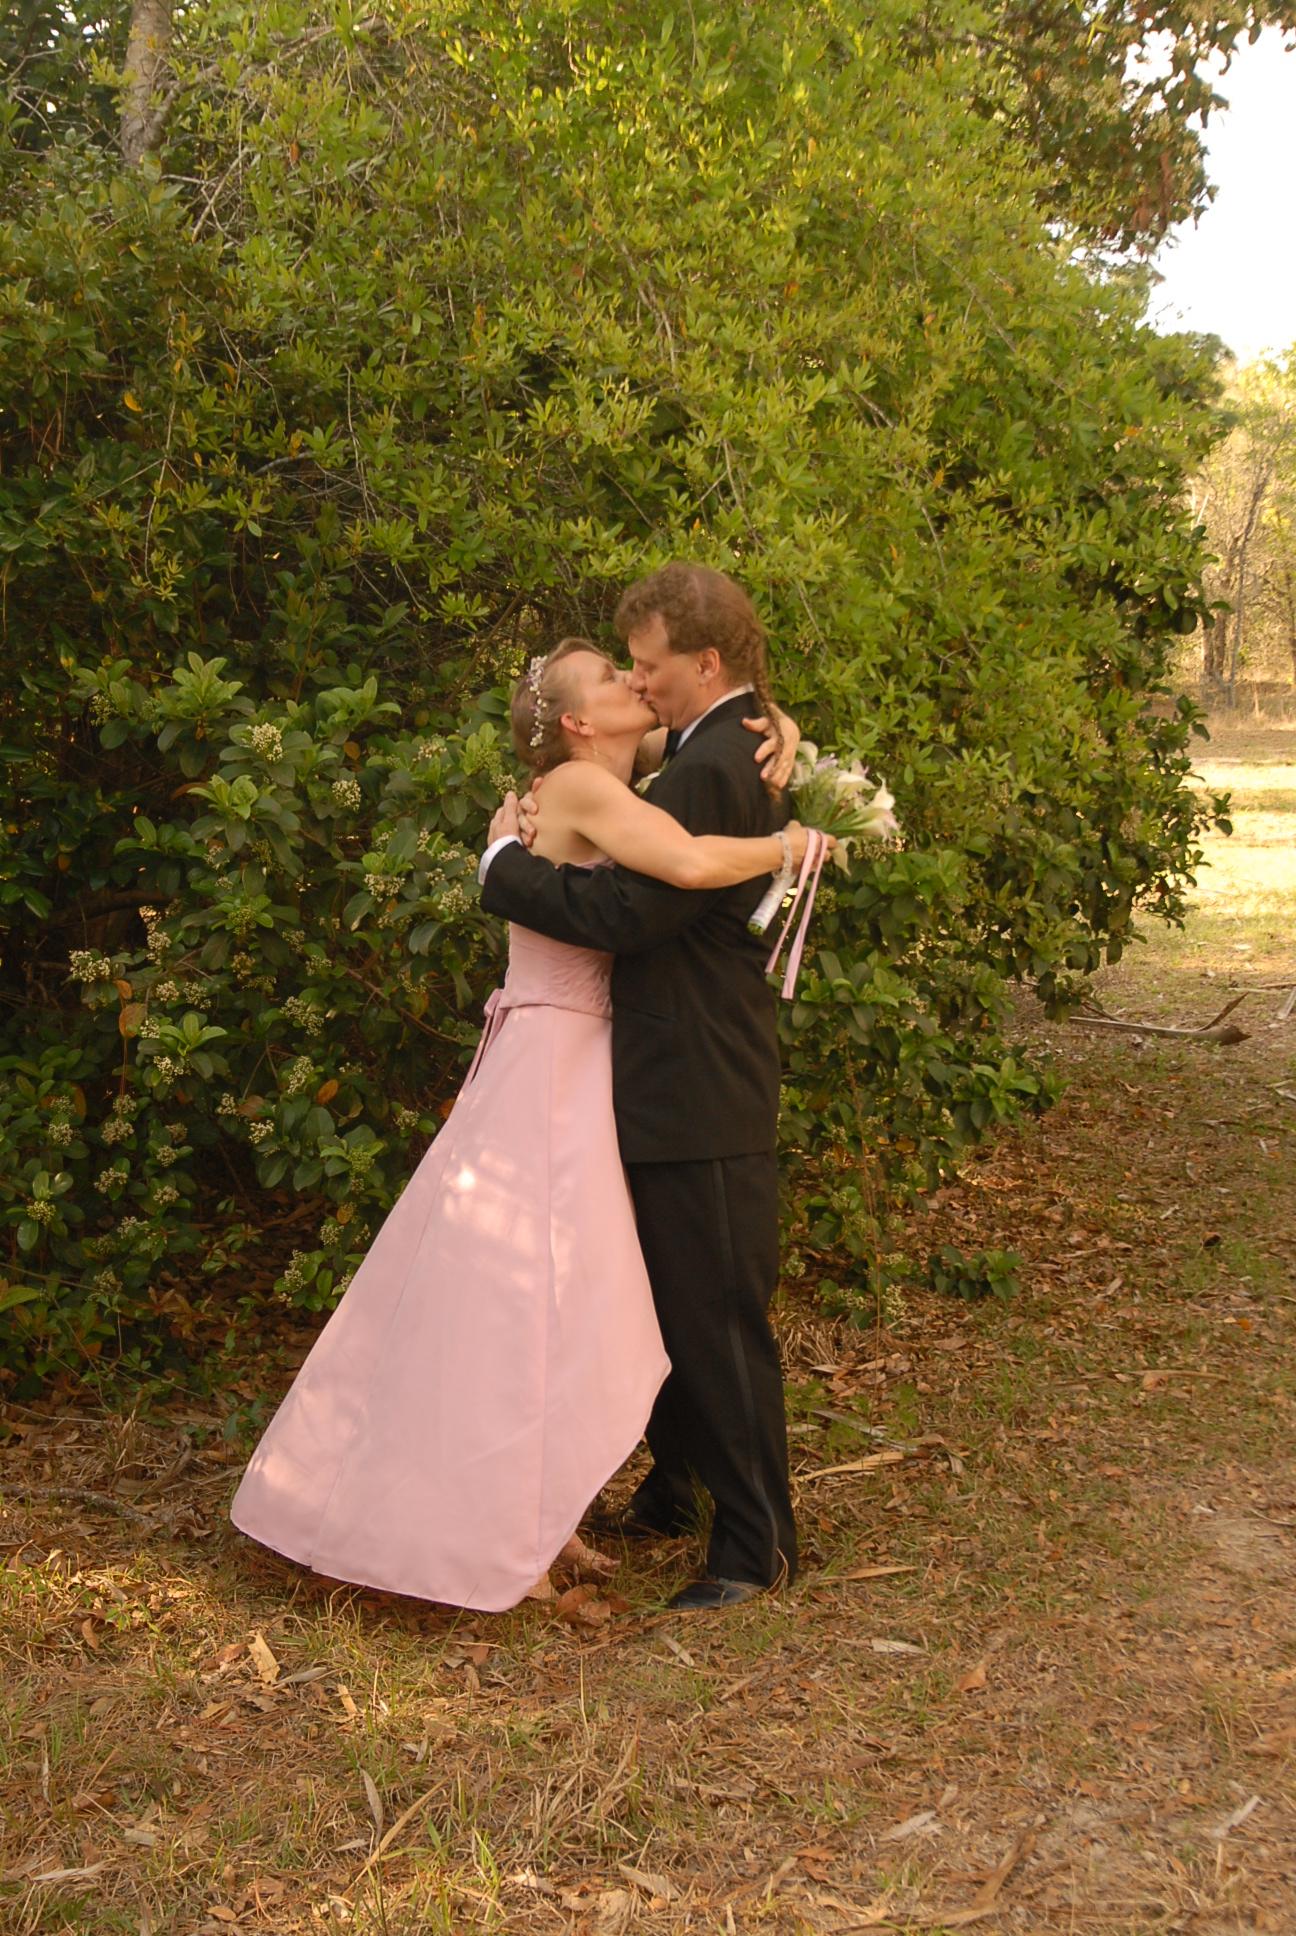 emily-and-travis-4-1-2013-april-fools-wedding-2-178